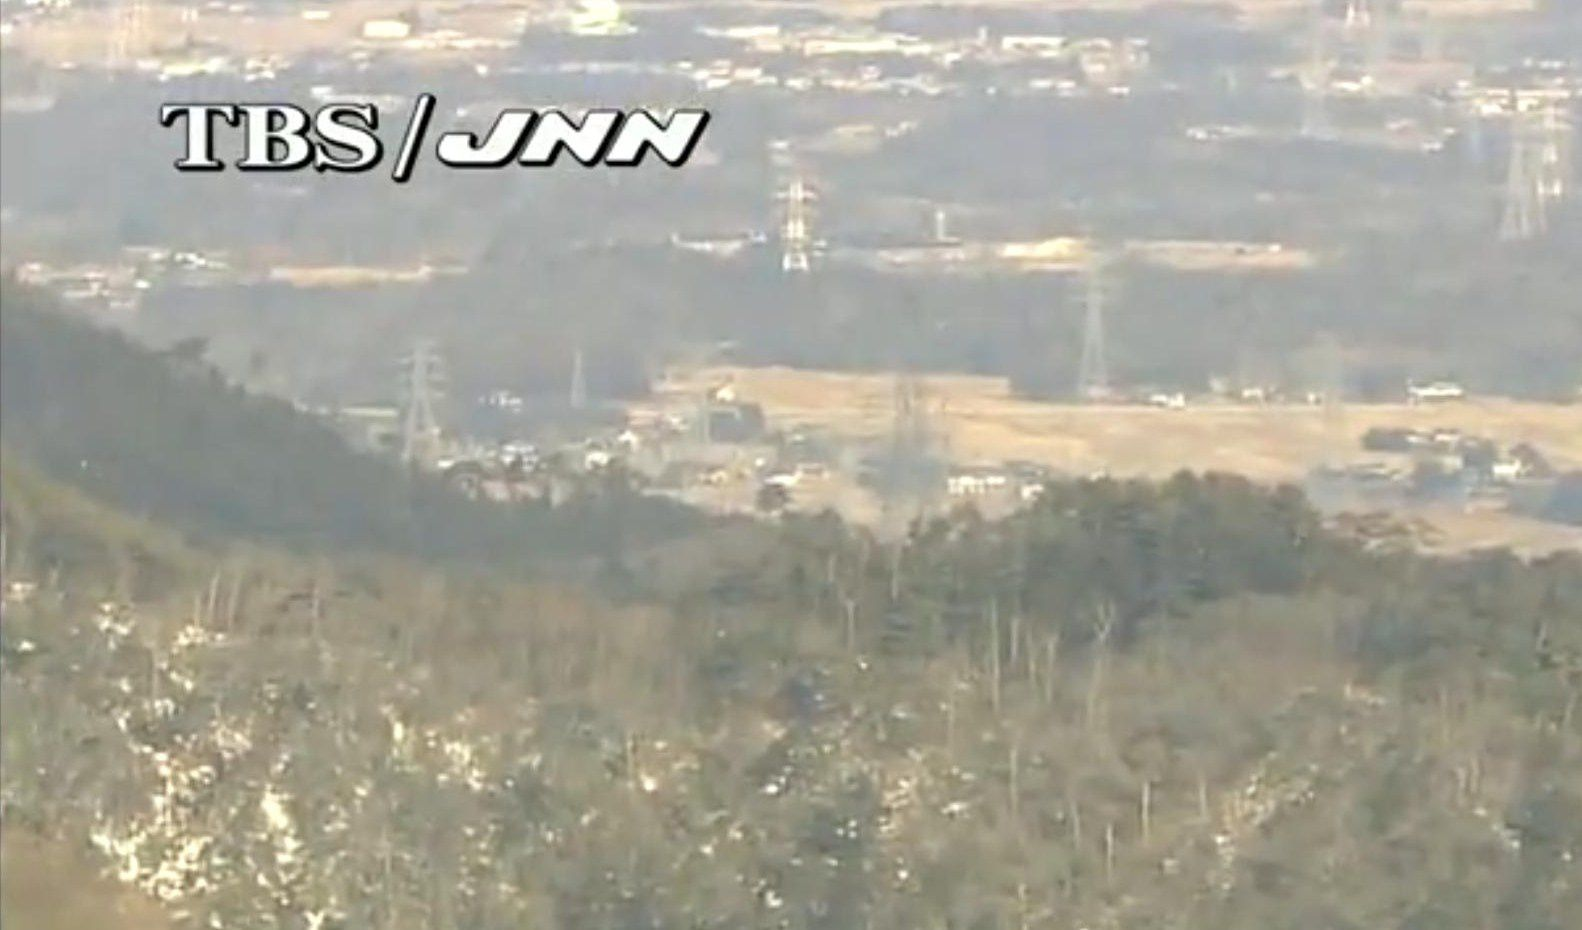 La webcam TBS/JNN surveille la centrale de Fukushima Daiichi